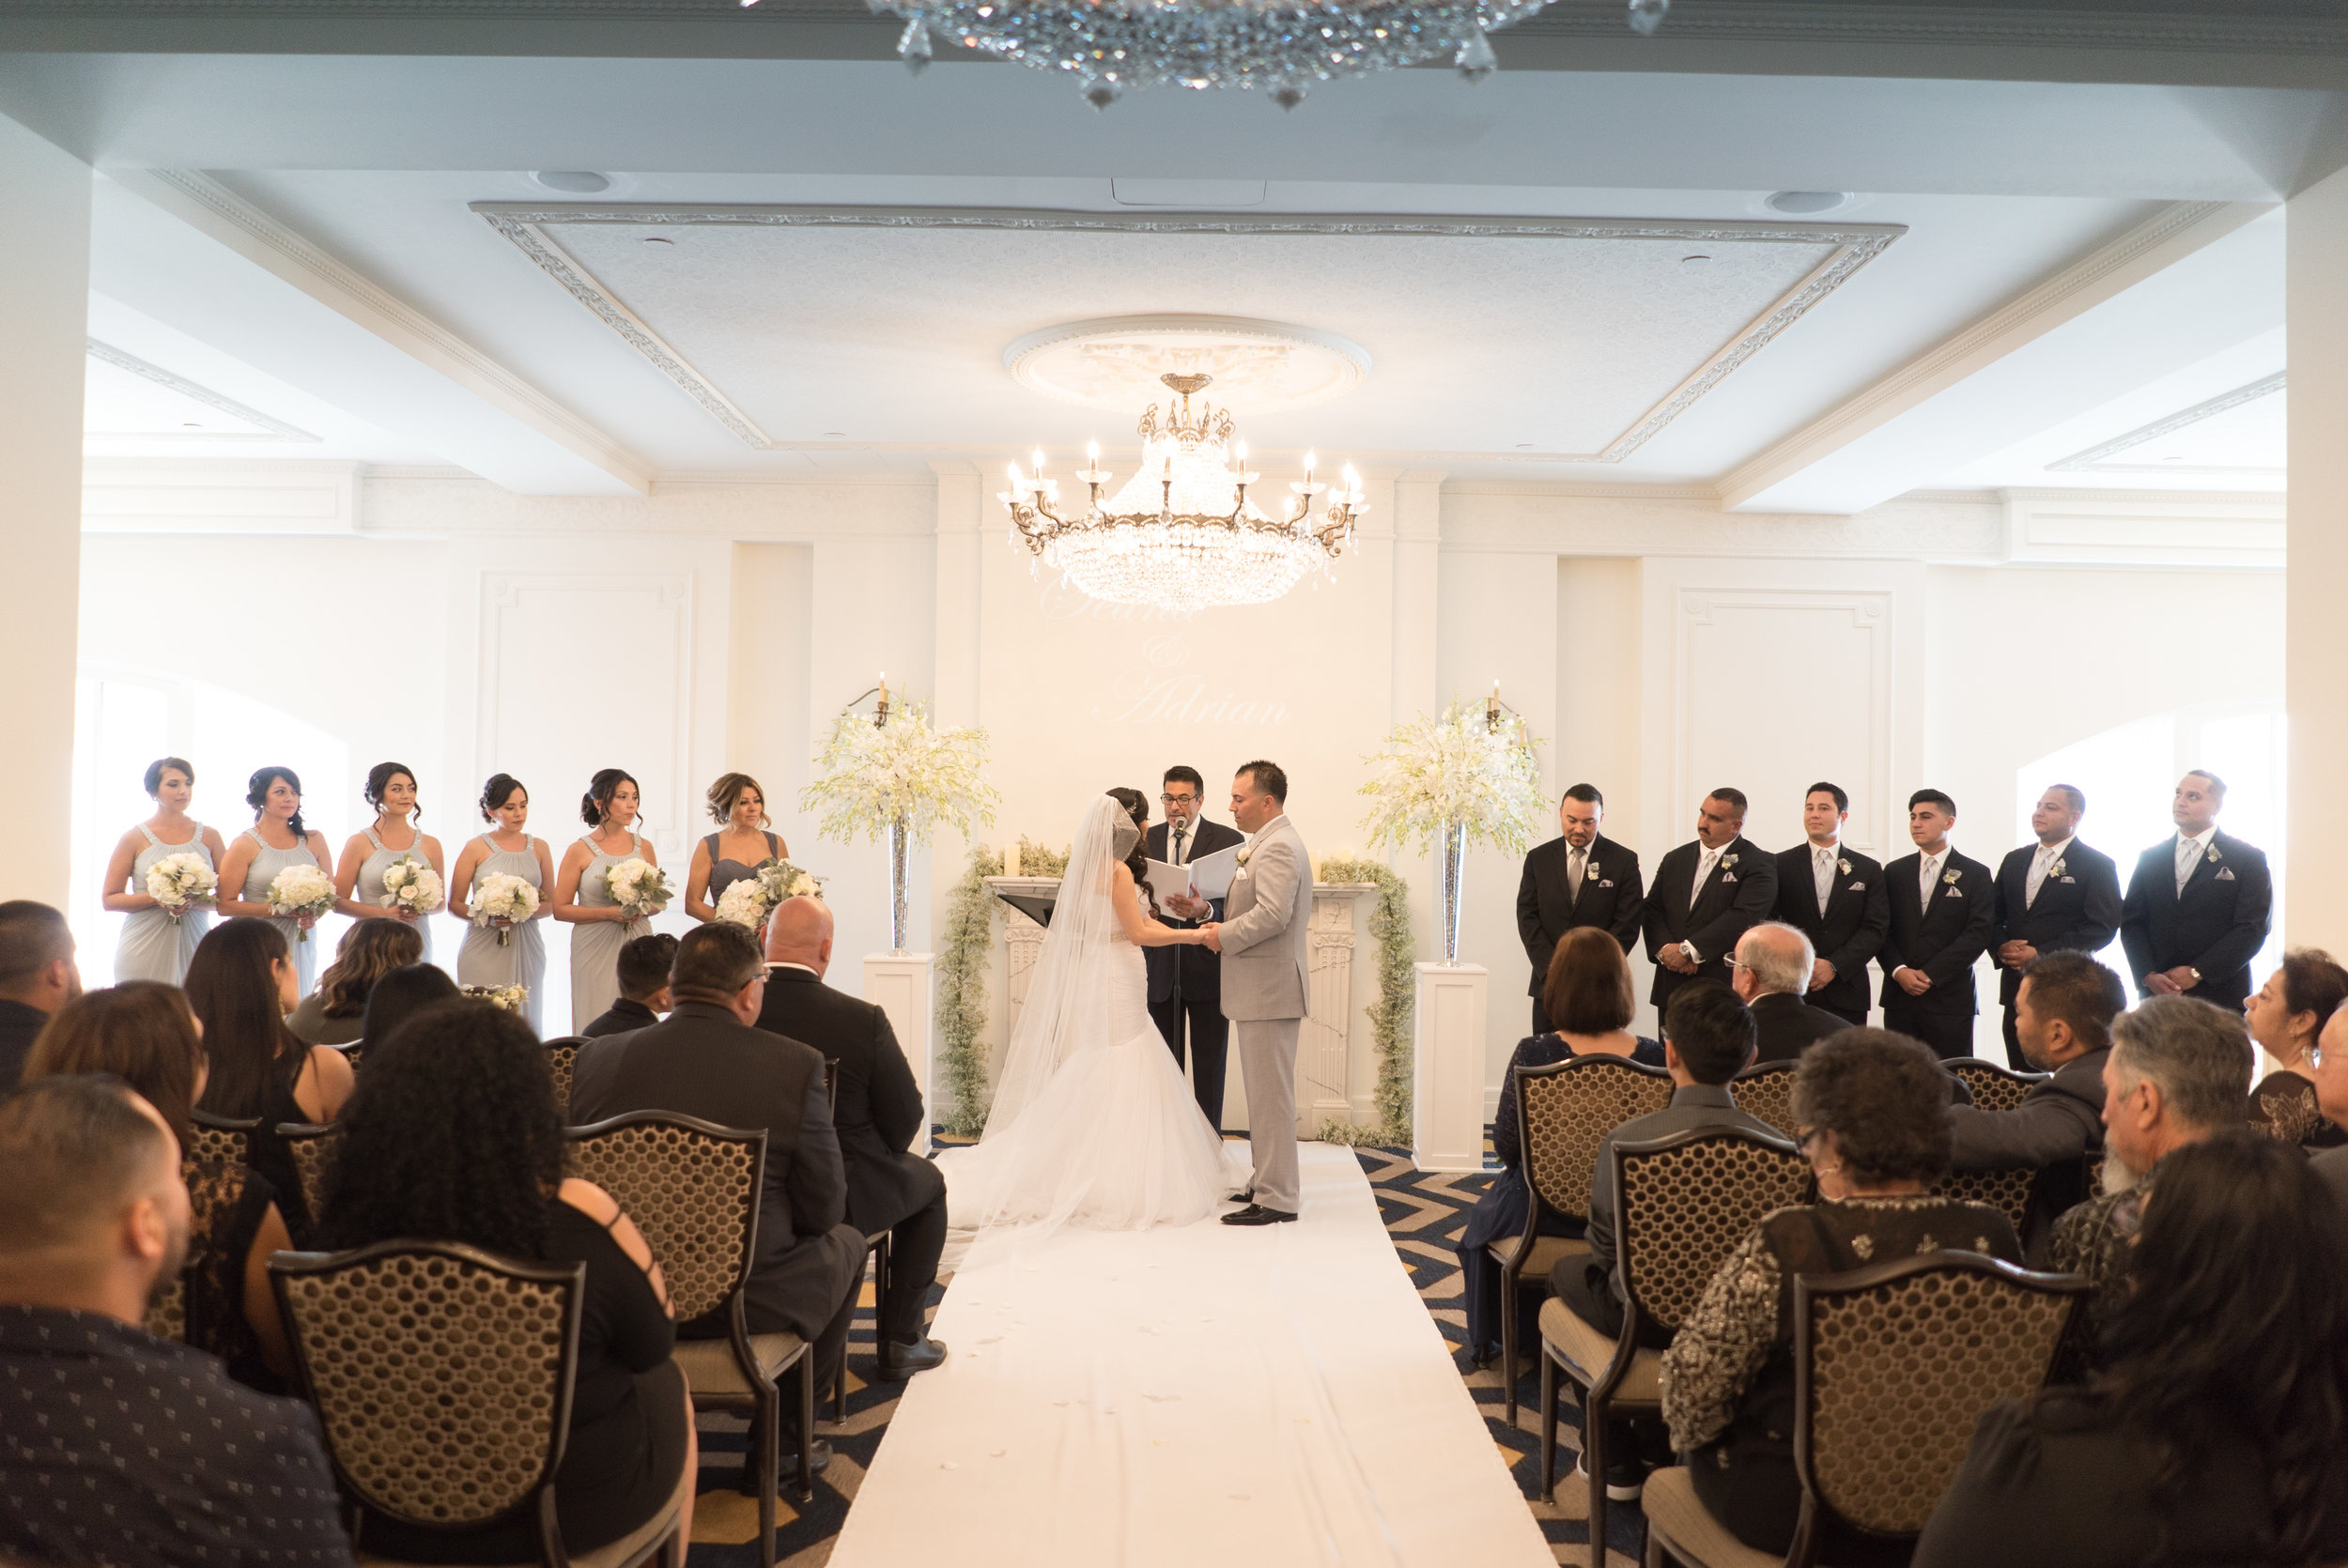 Joe - Wedding Officiant